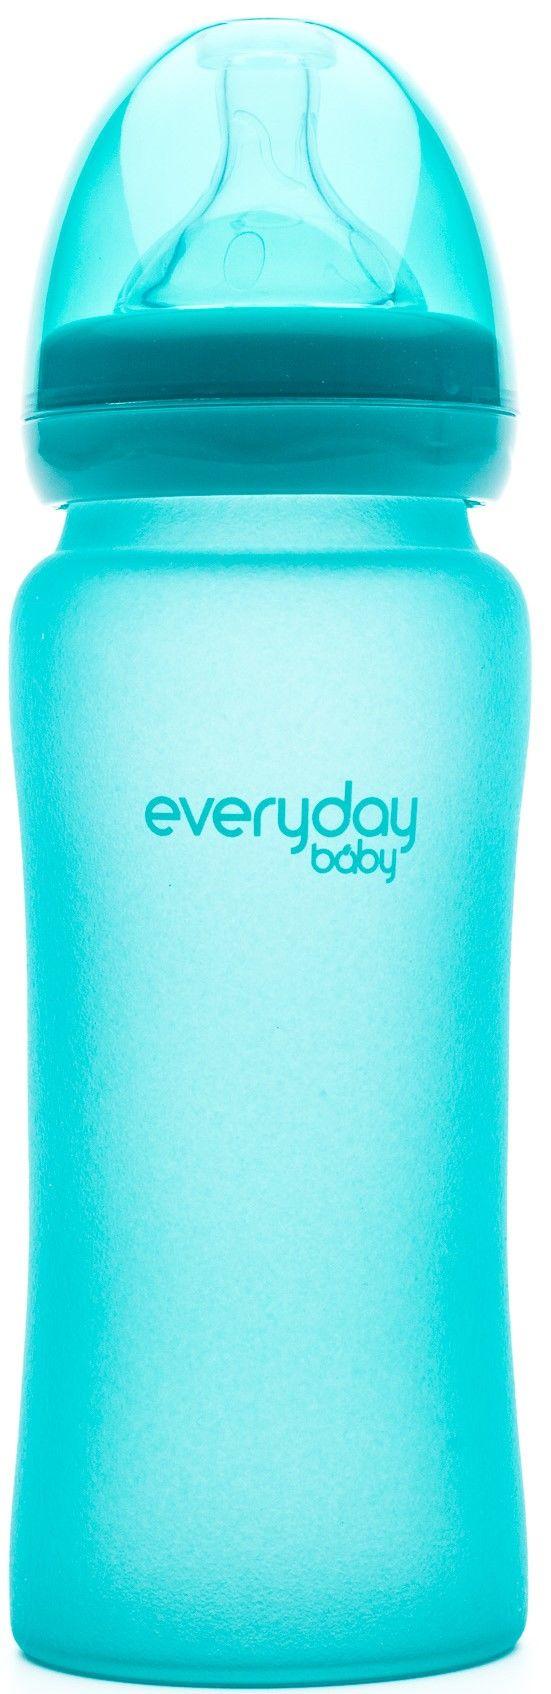 Everyday Baby Nappflaska Värmin 300ml,Turquoise